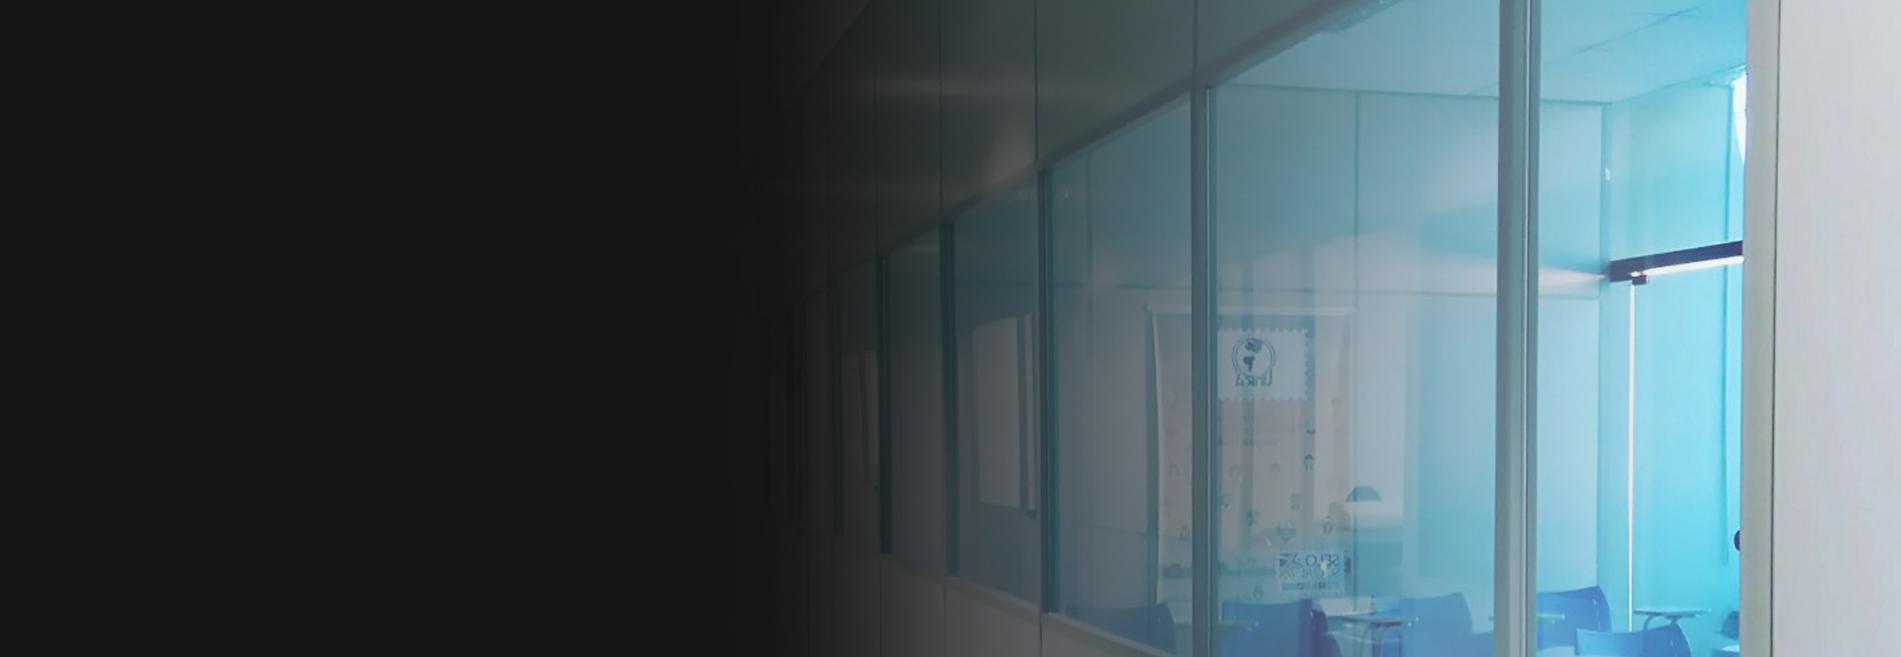 Banner da bfsor sobre Drywall em Sorocaba 1725x657 2018